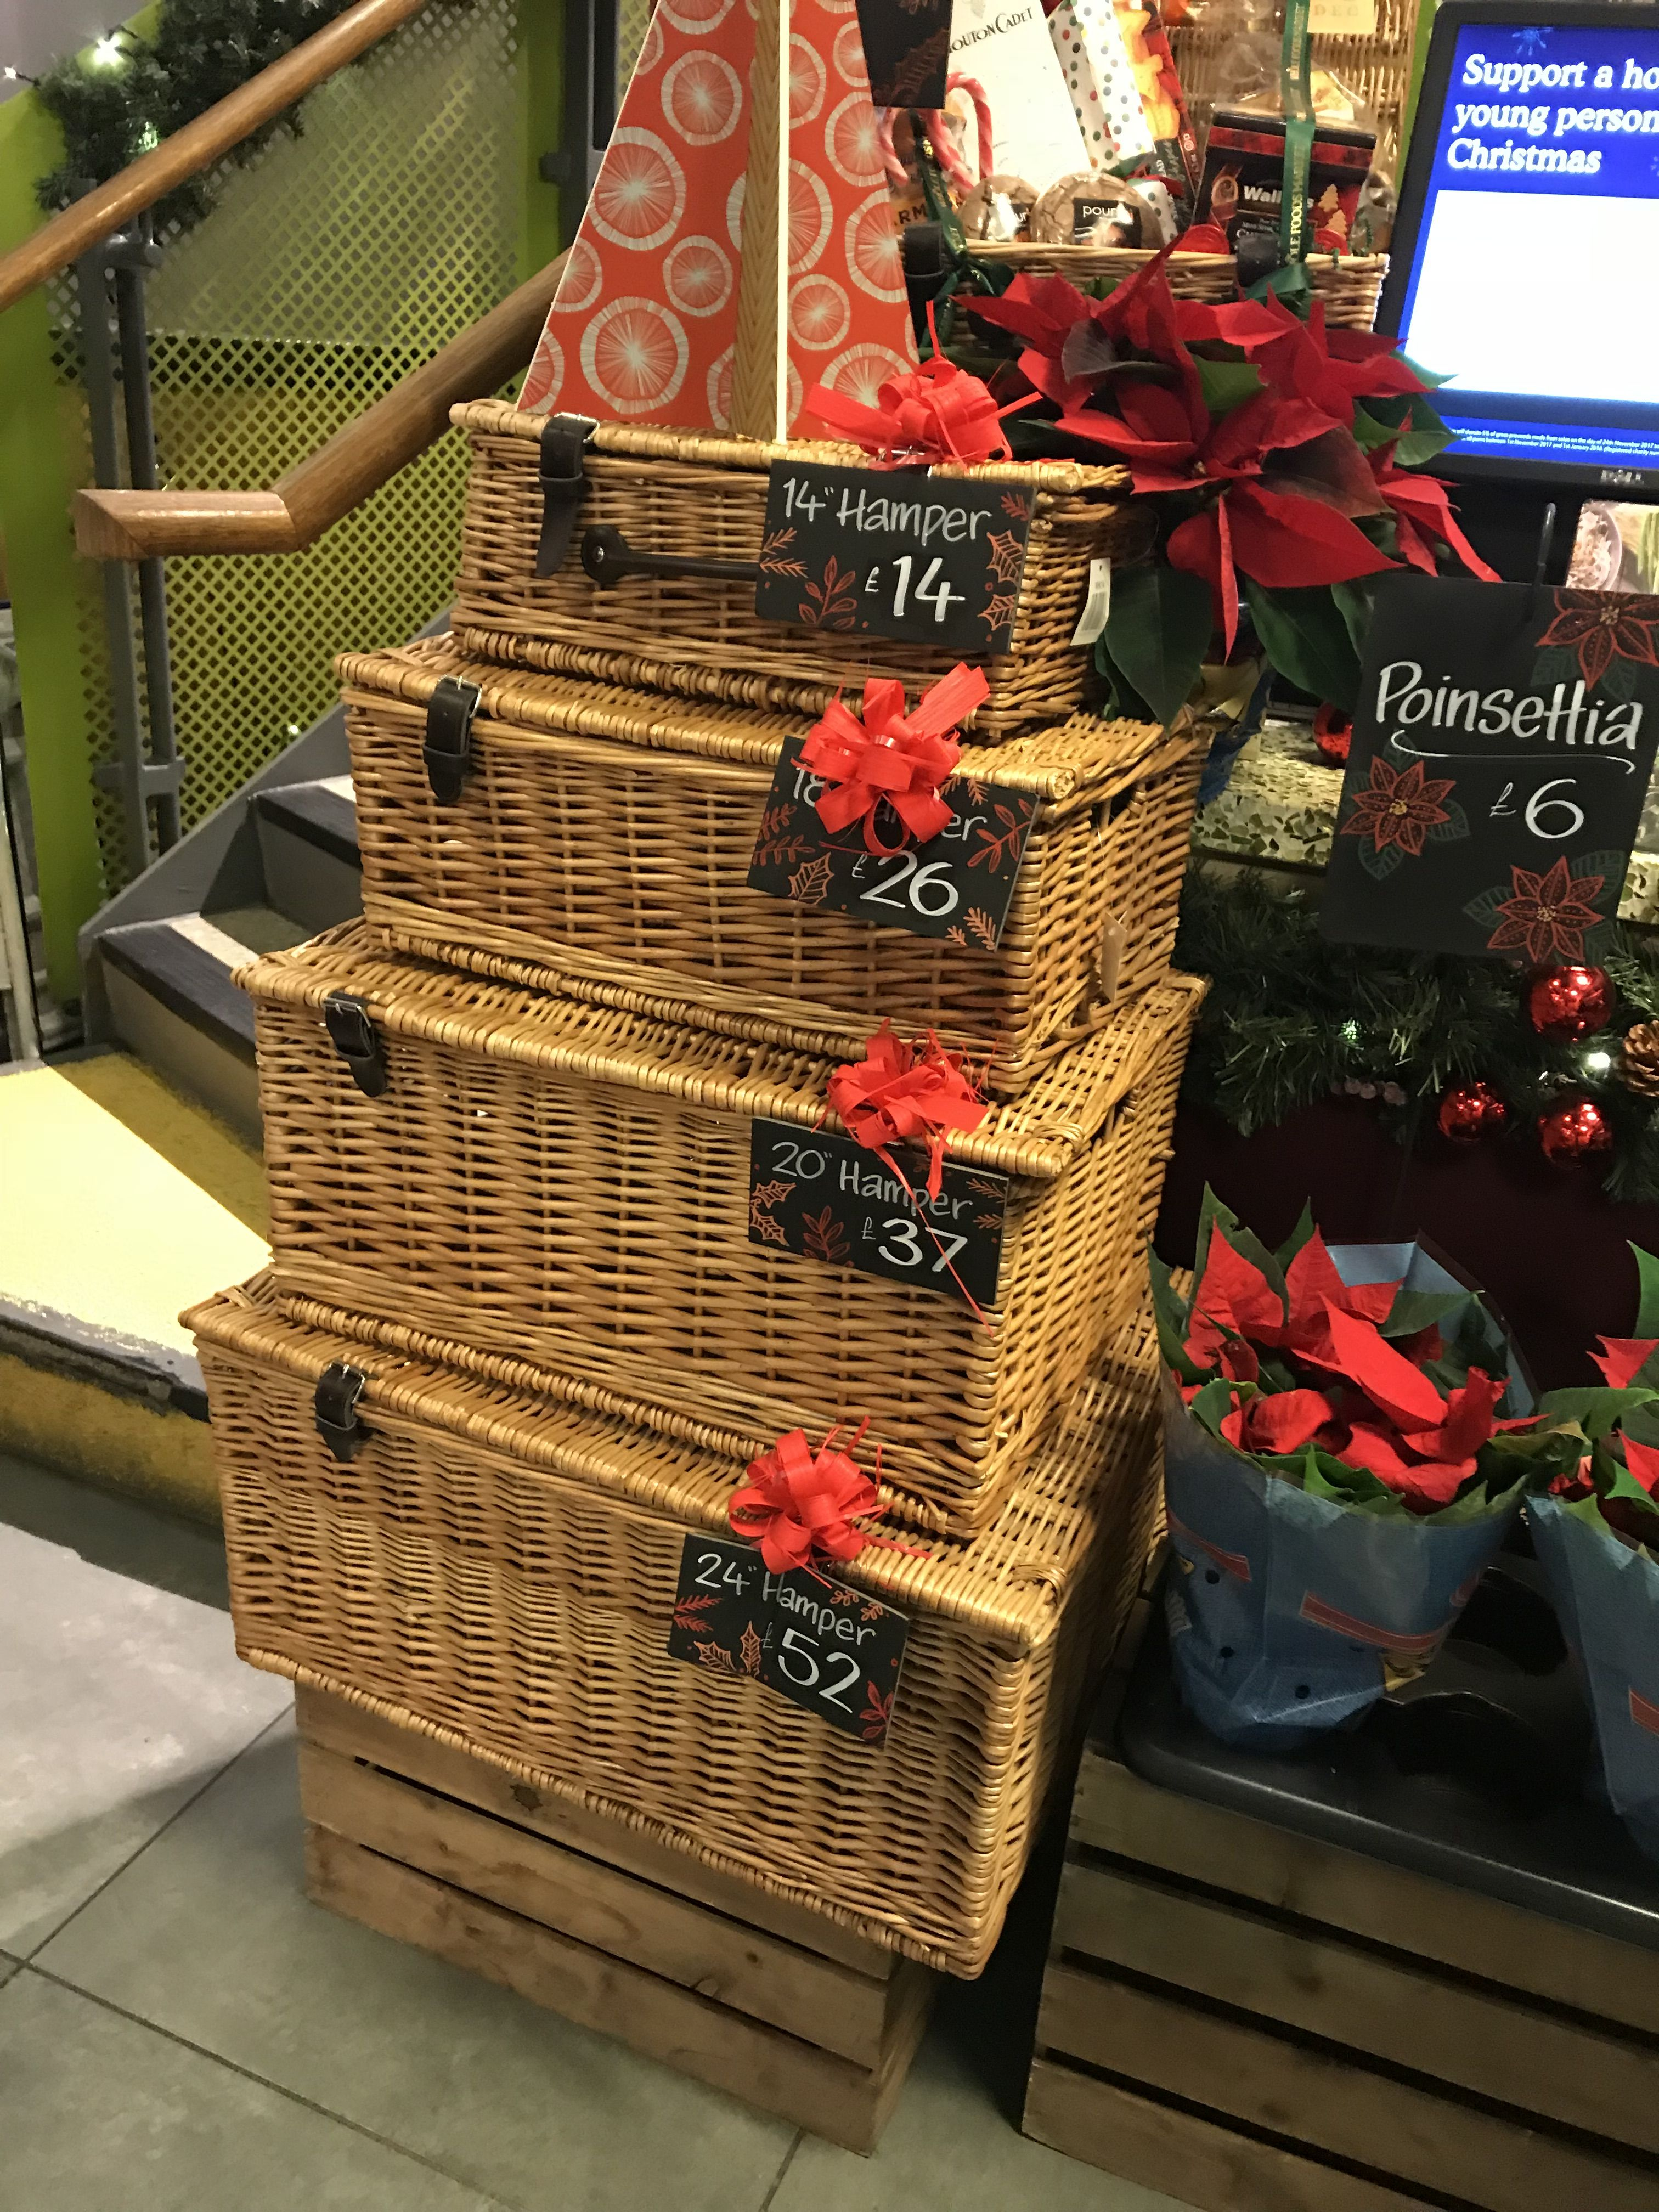 whole foods market wicker hamper nested set of wicker supplied by wbc gift packaging